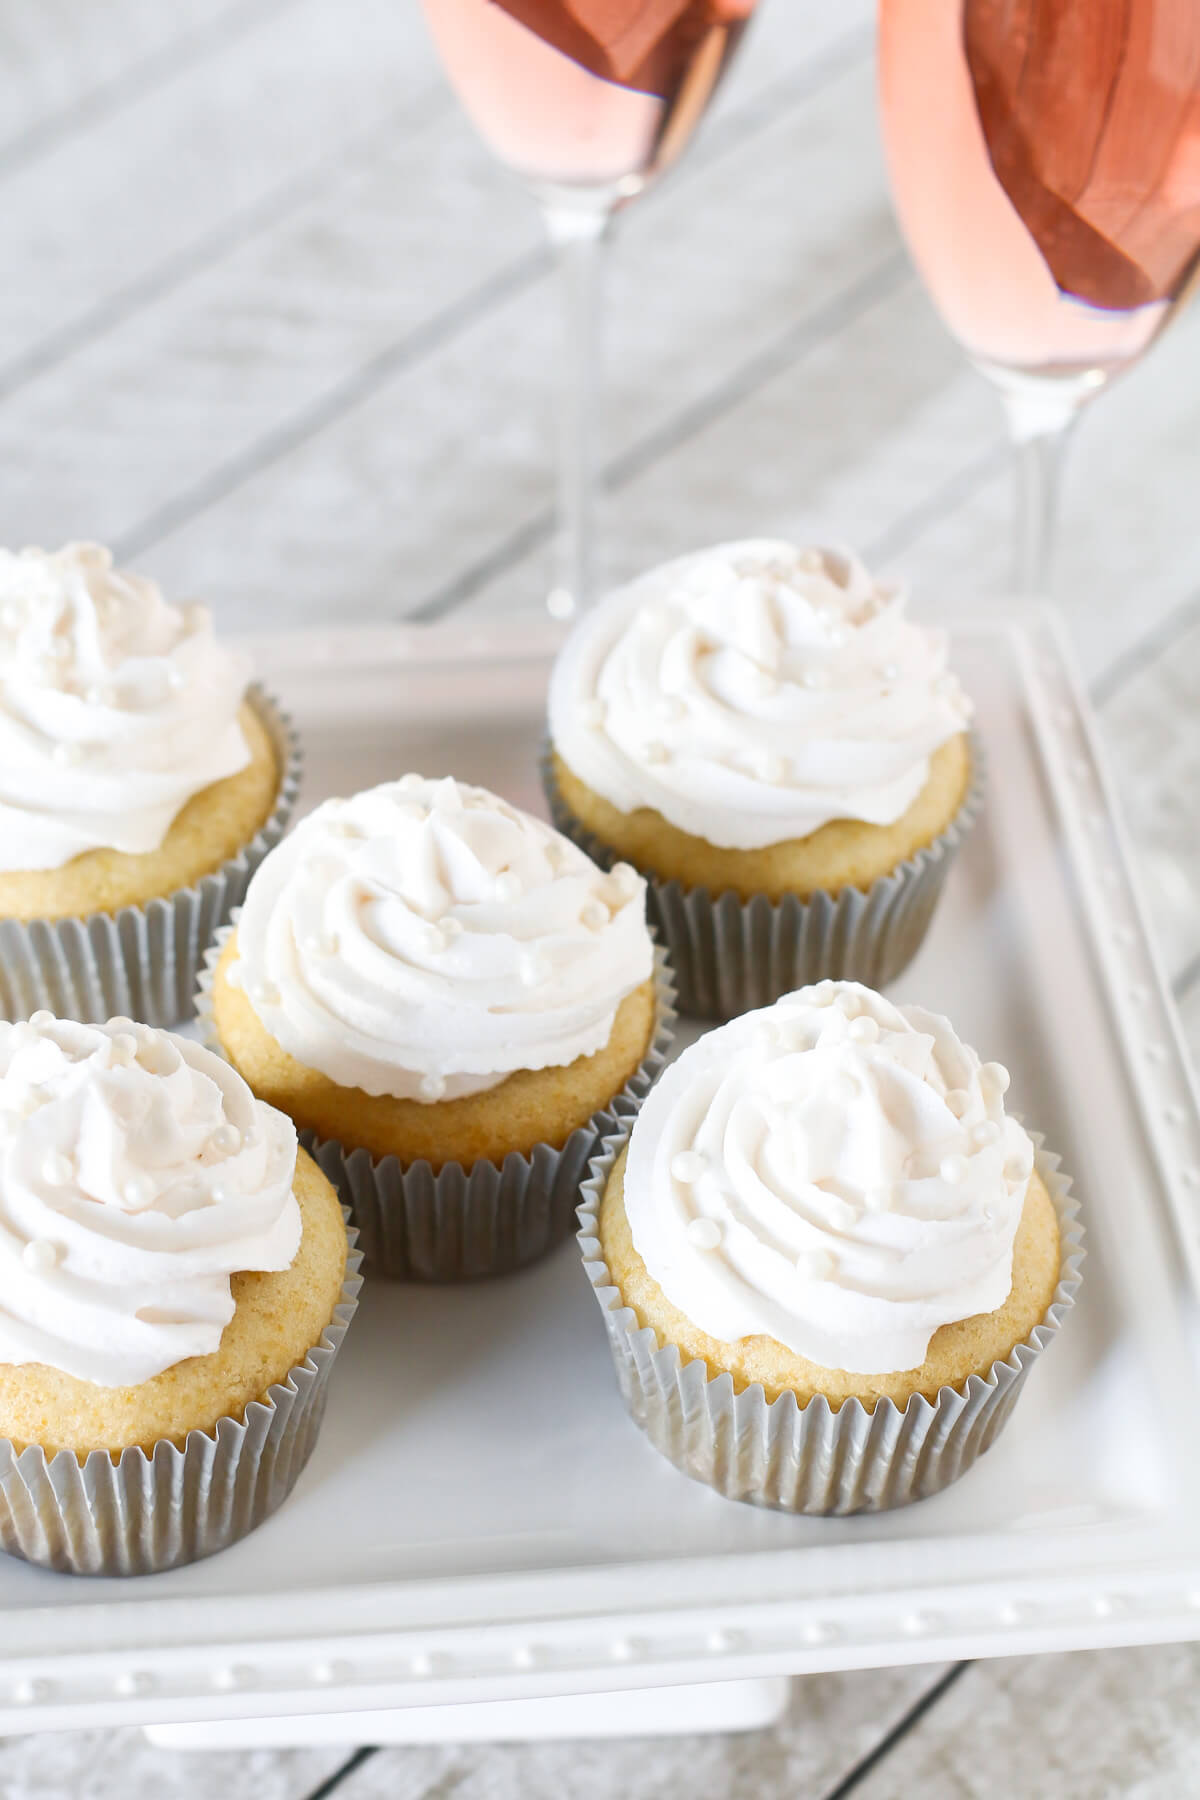 Vegan Champagne Cupcakes (gluten-free)